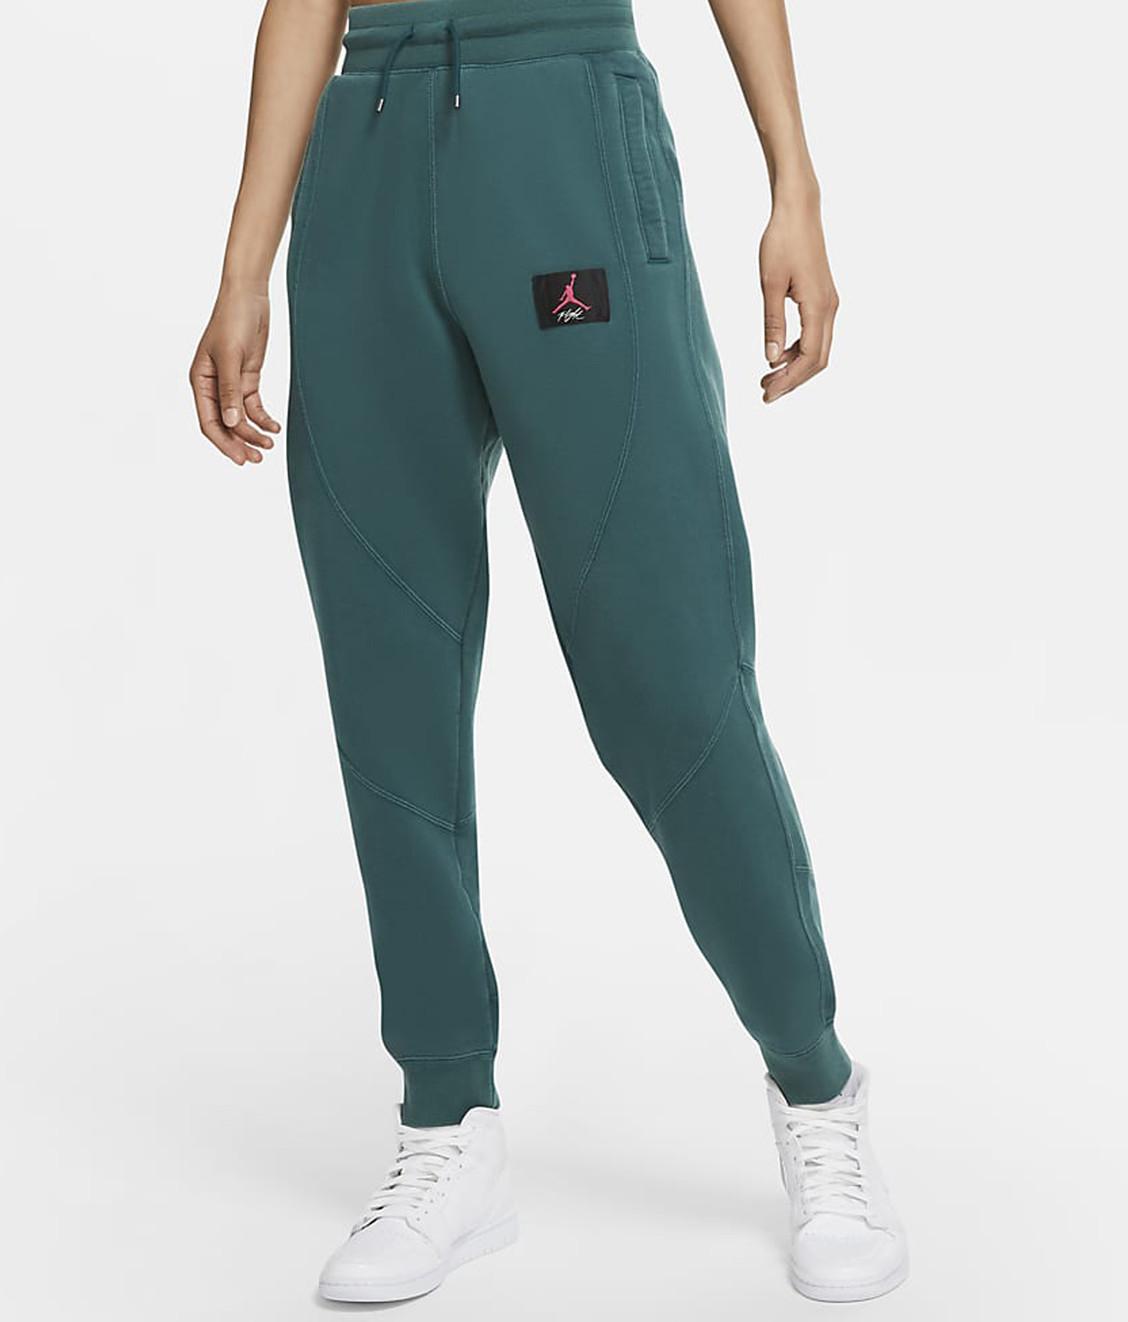 Nike Jordan Flight Fleece Trousers Atomic Teal